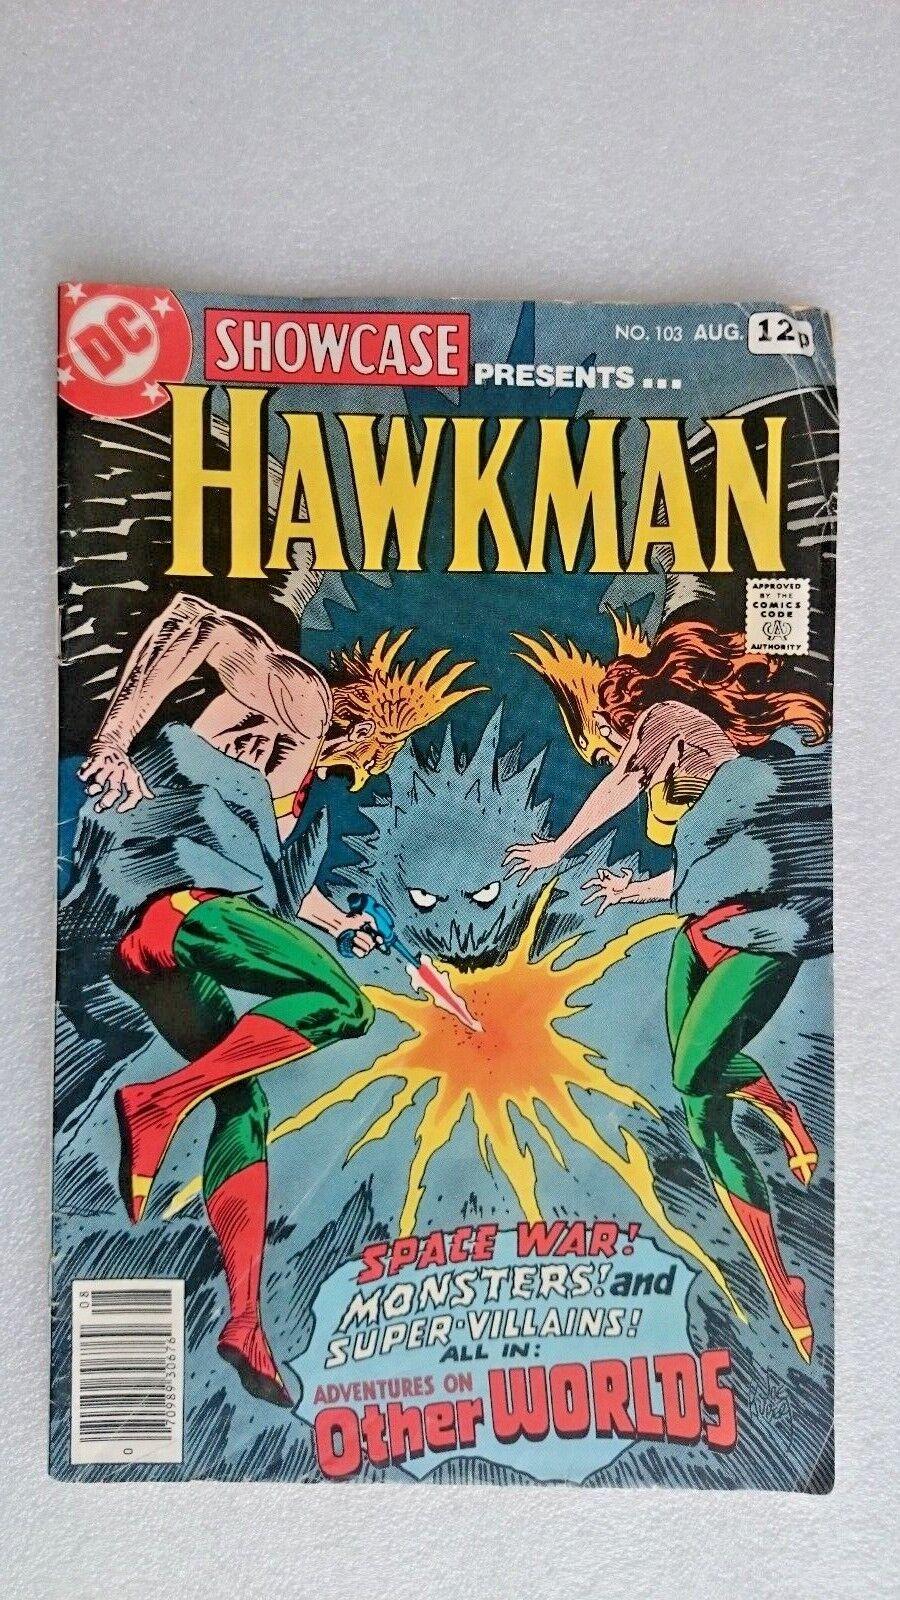 Hawkman  DC Comic Issue Aug No 103 (1978)